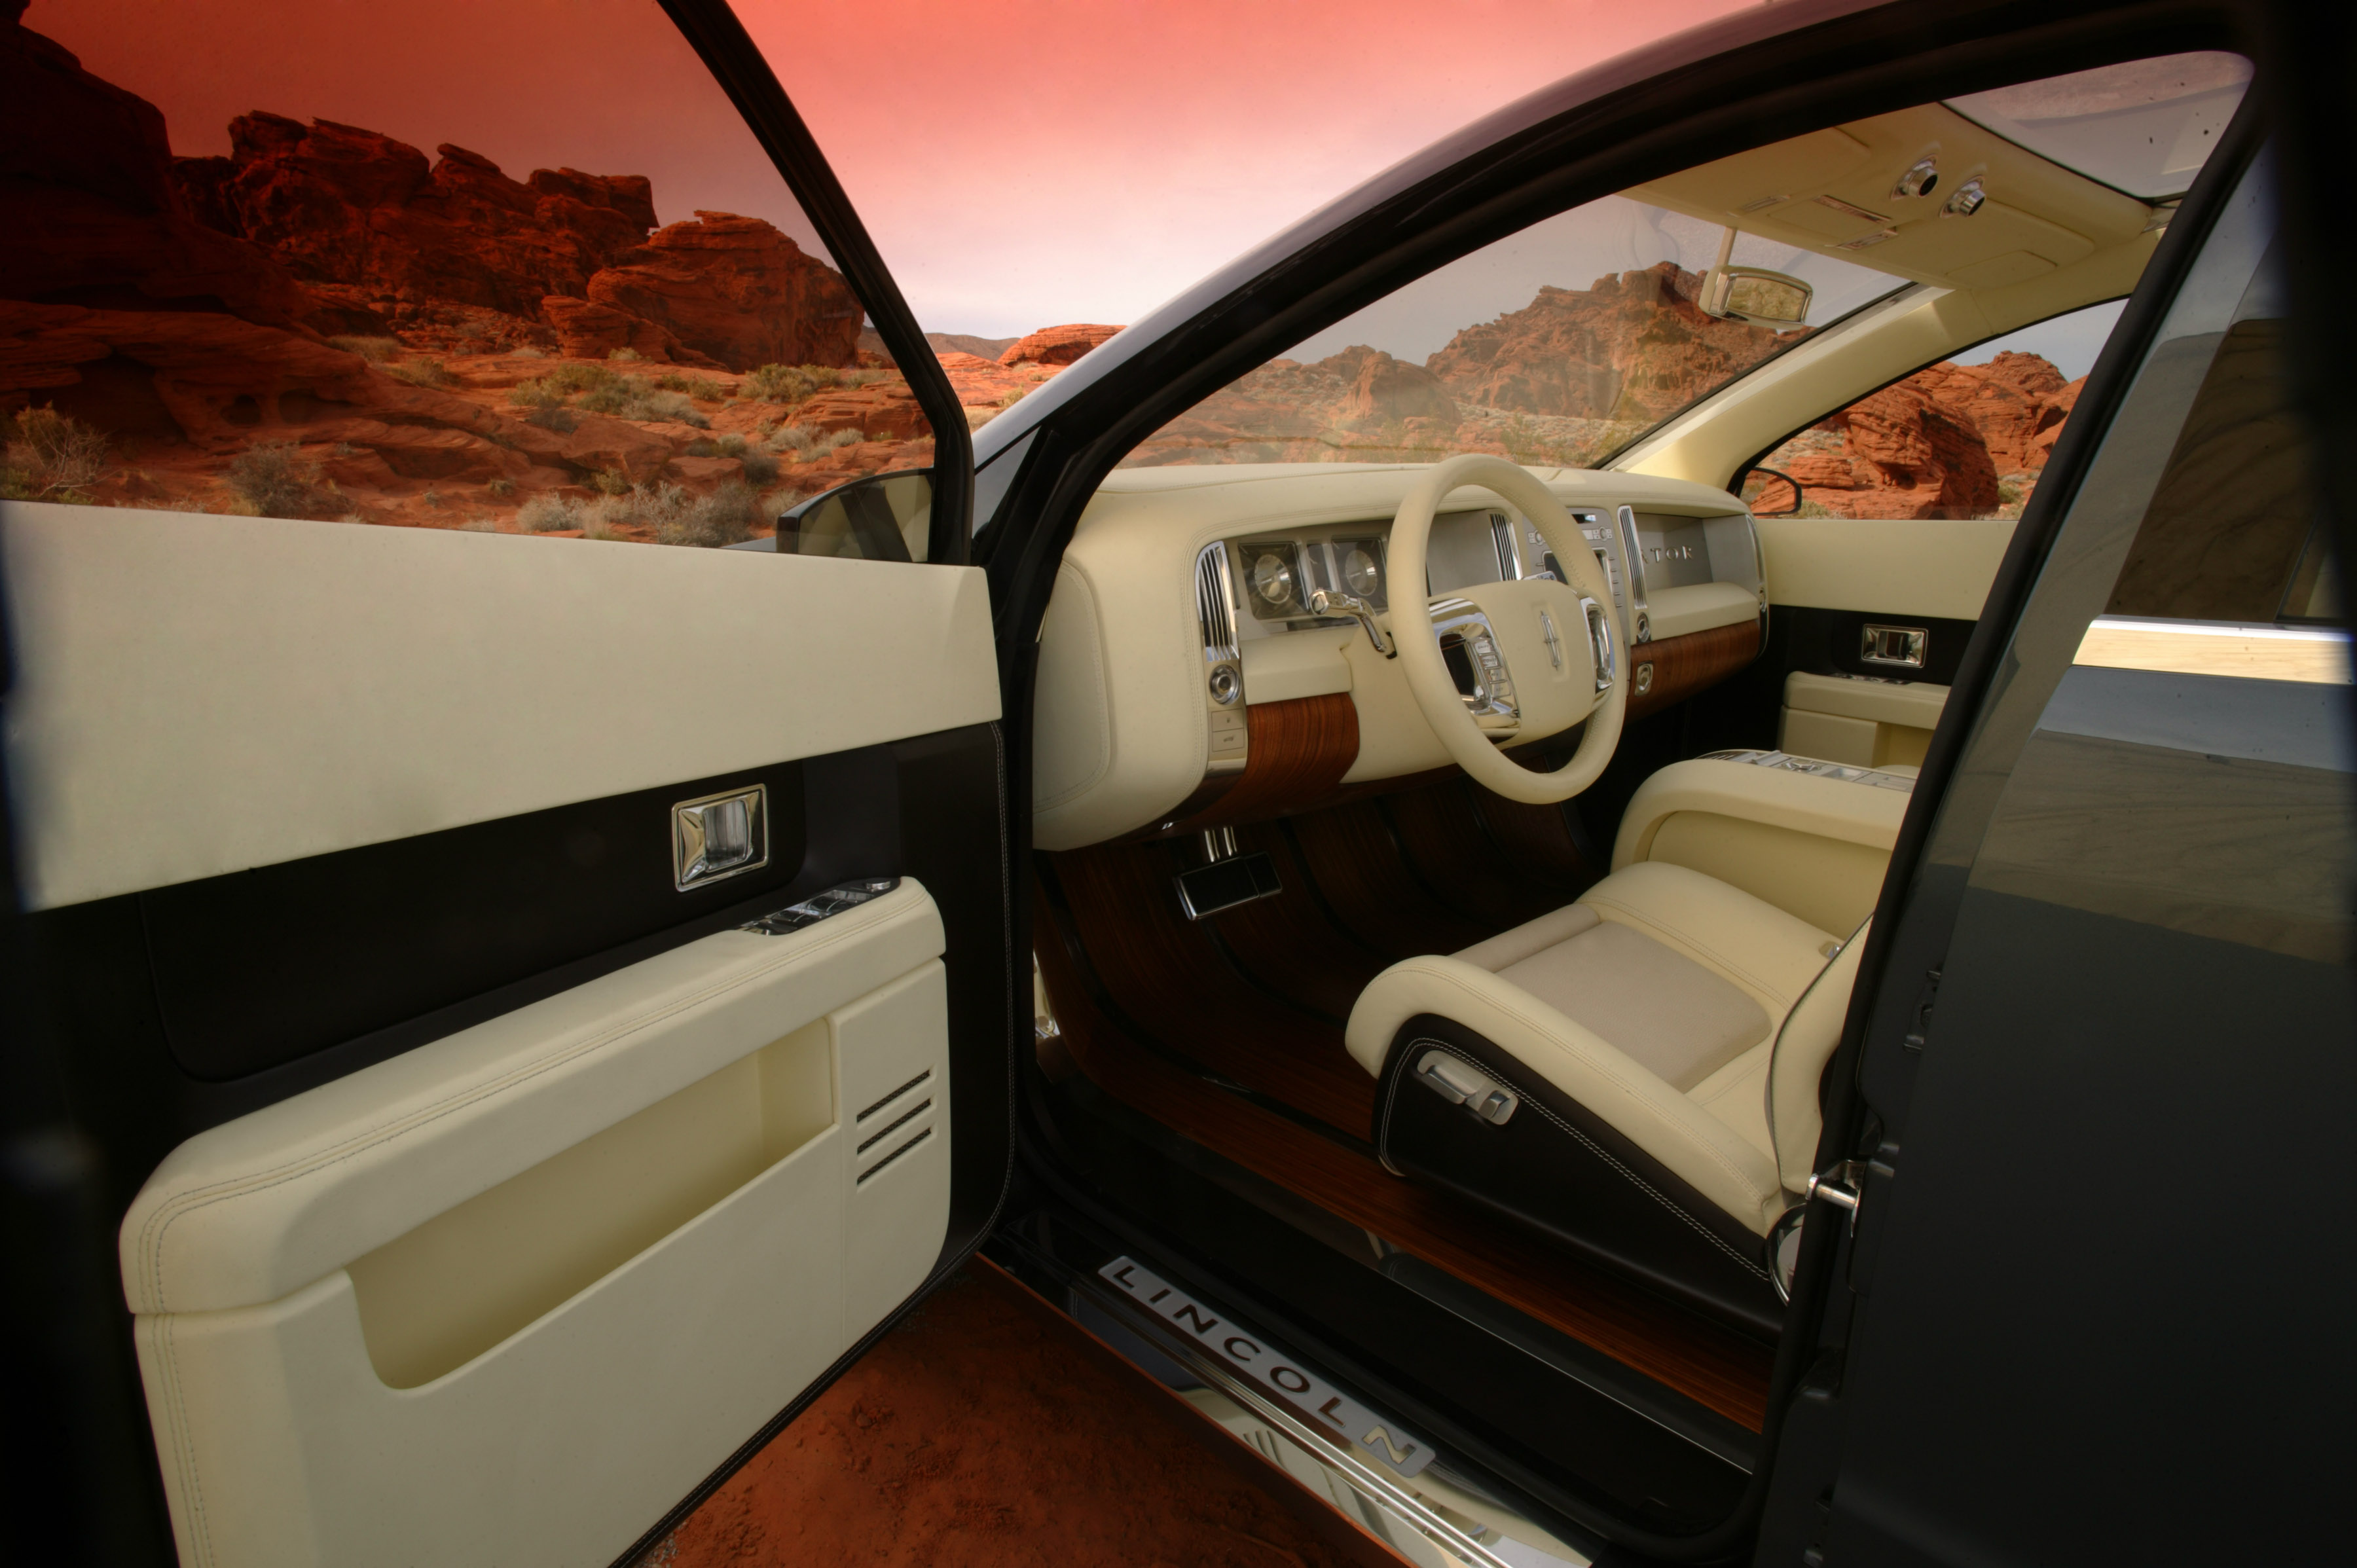 https://www.automobilesreview.com/gallery/lincoln-aviator-next-generation-concept/lincoln-aviator-concept-19.jpg